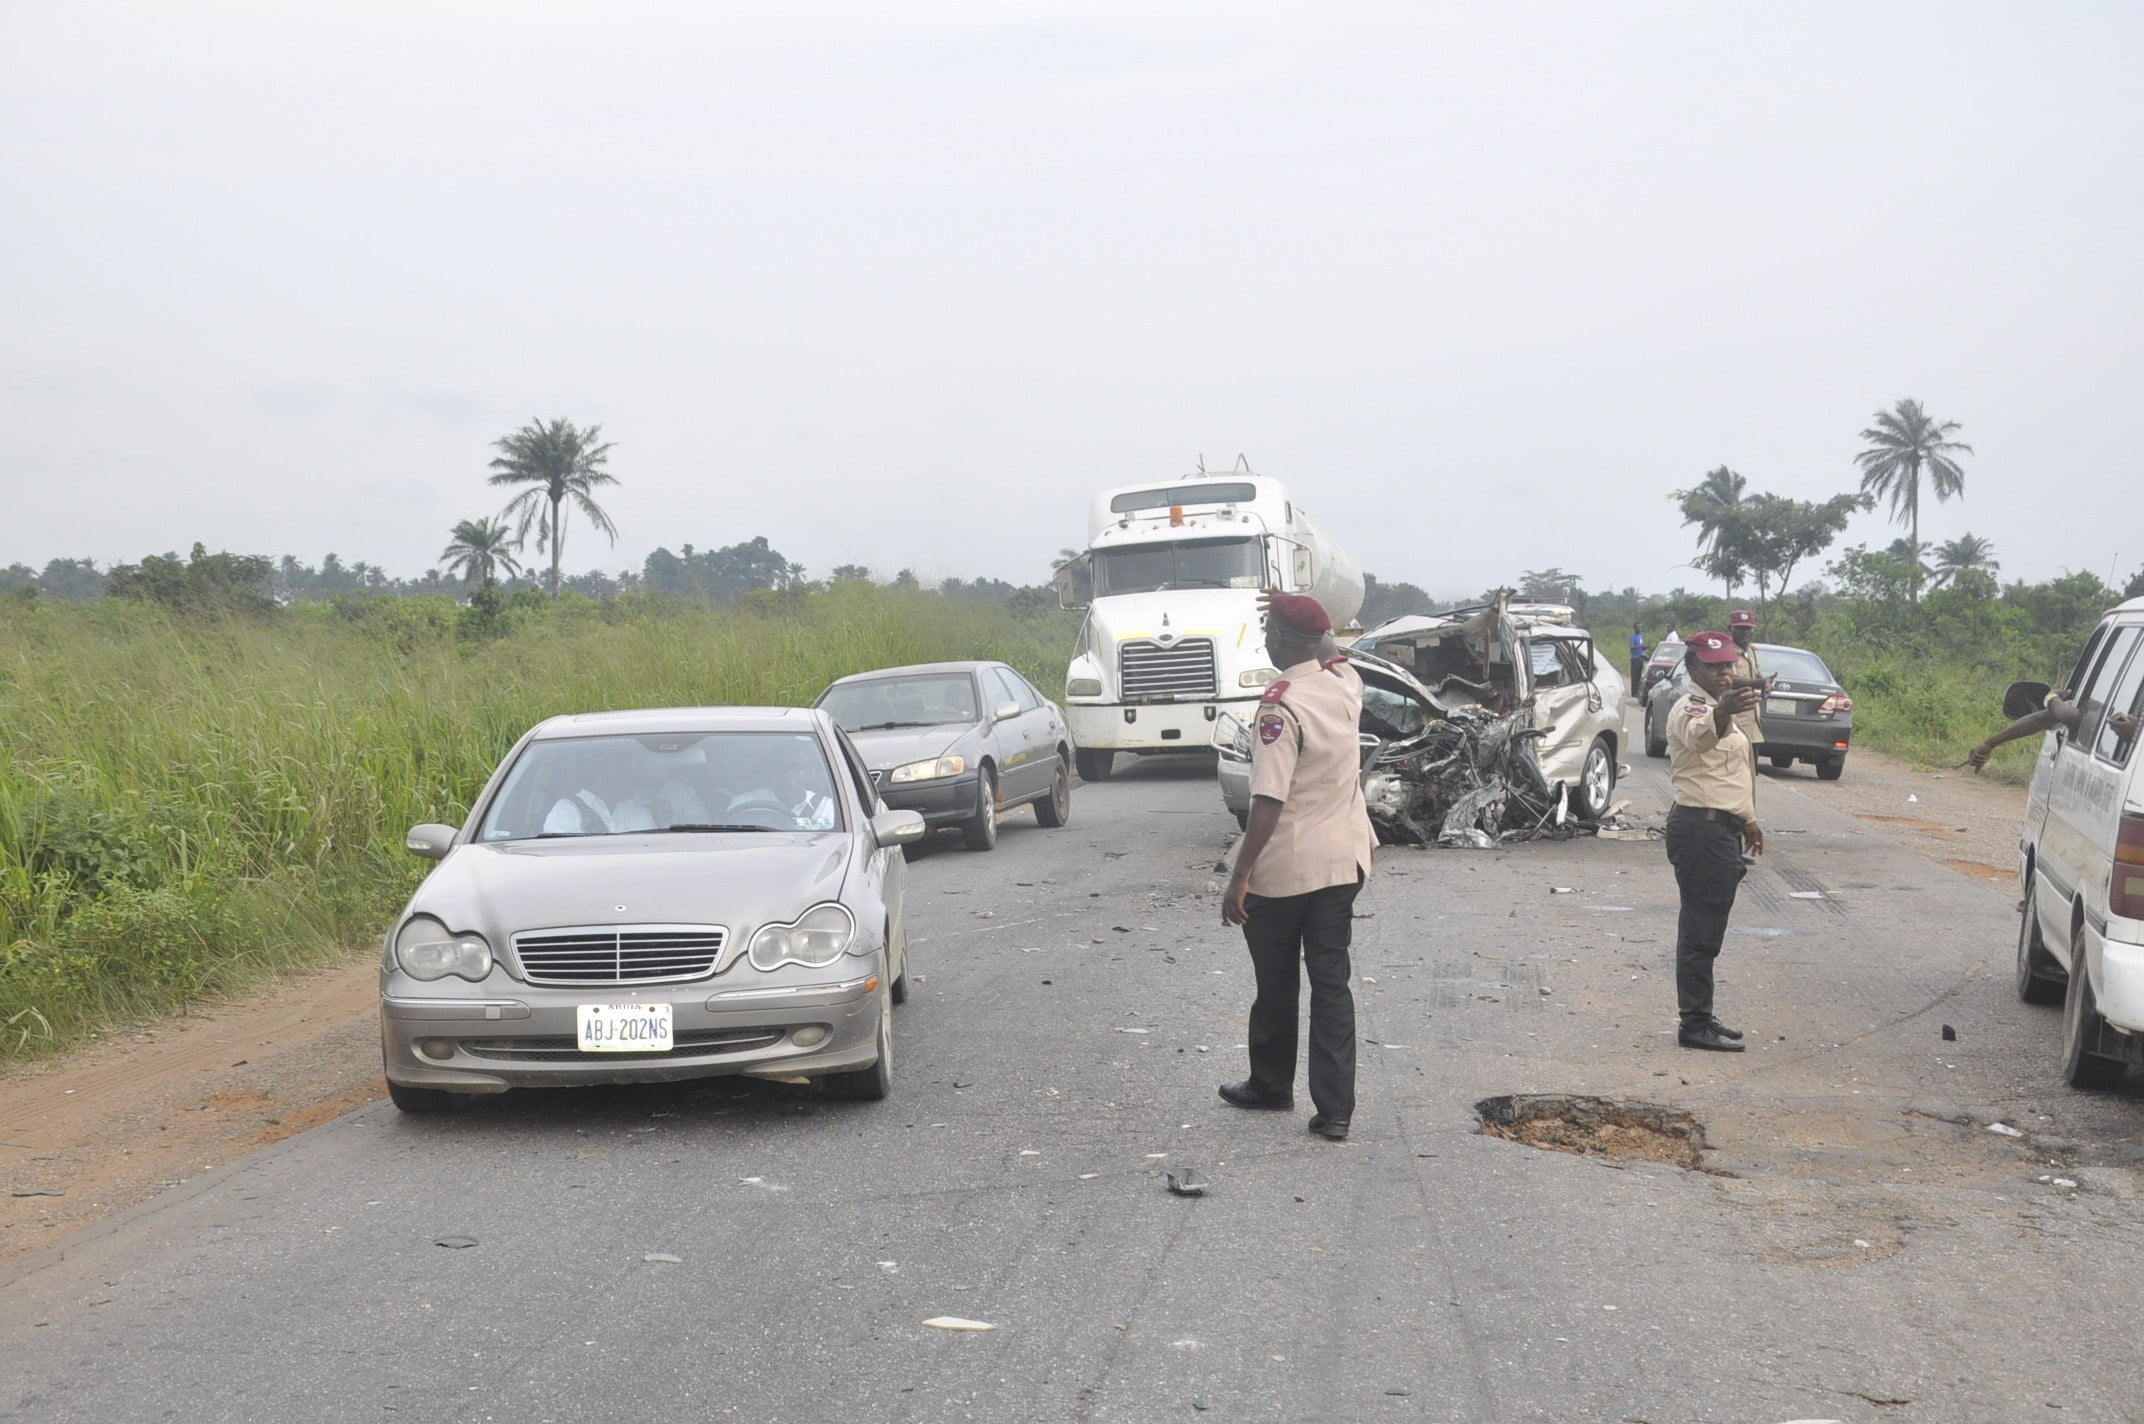 FRSC Officials controling traffic at the accident scene - Kerosine tanker falls on Lagos-Ibadan expressway, injures driver